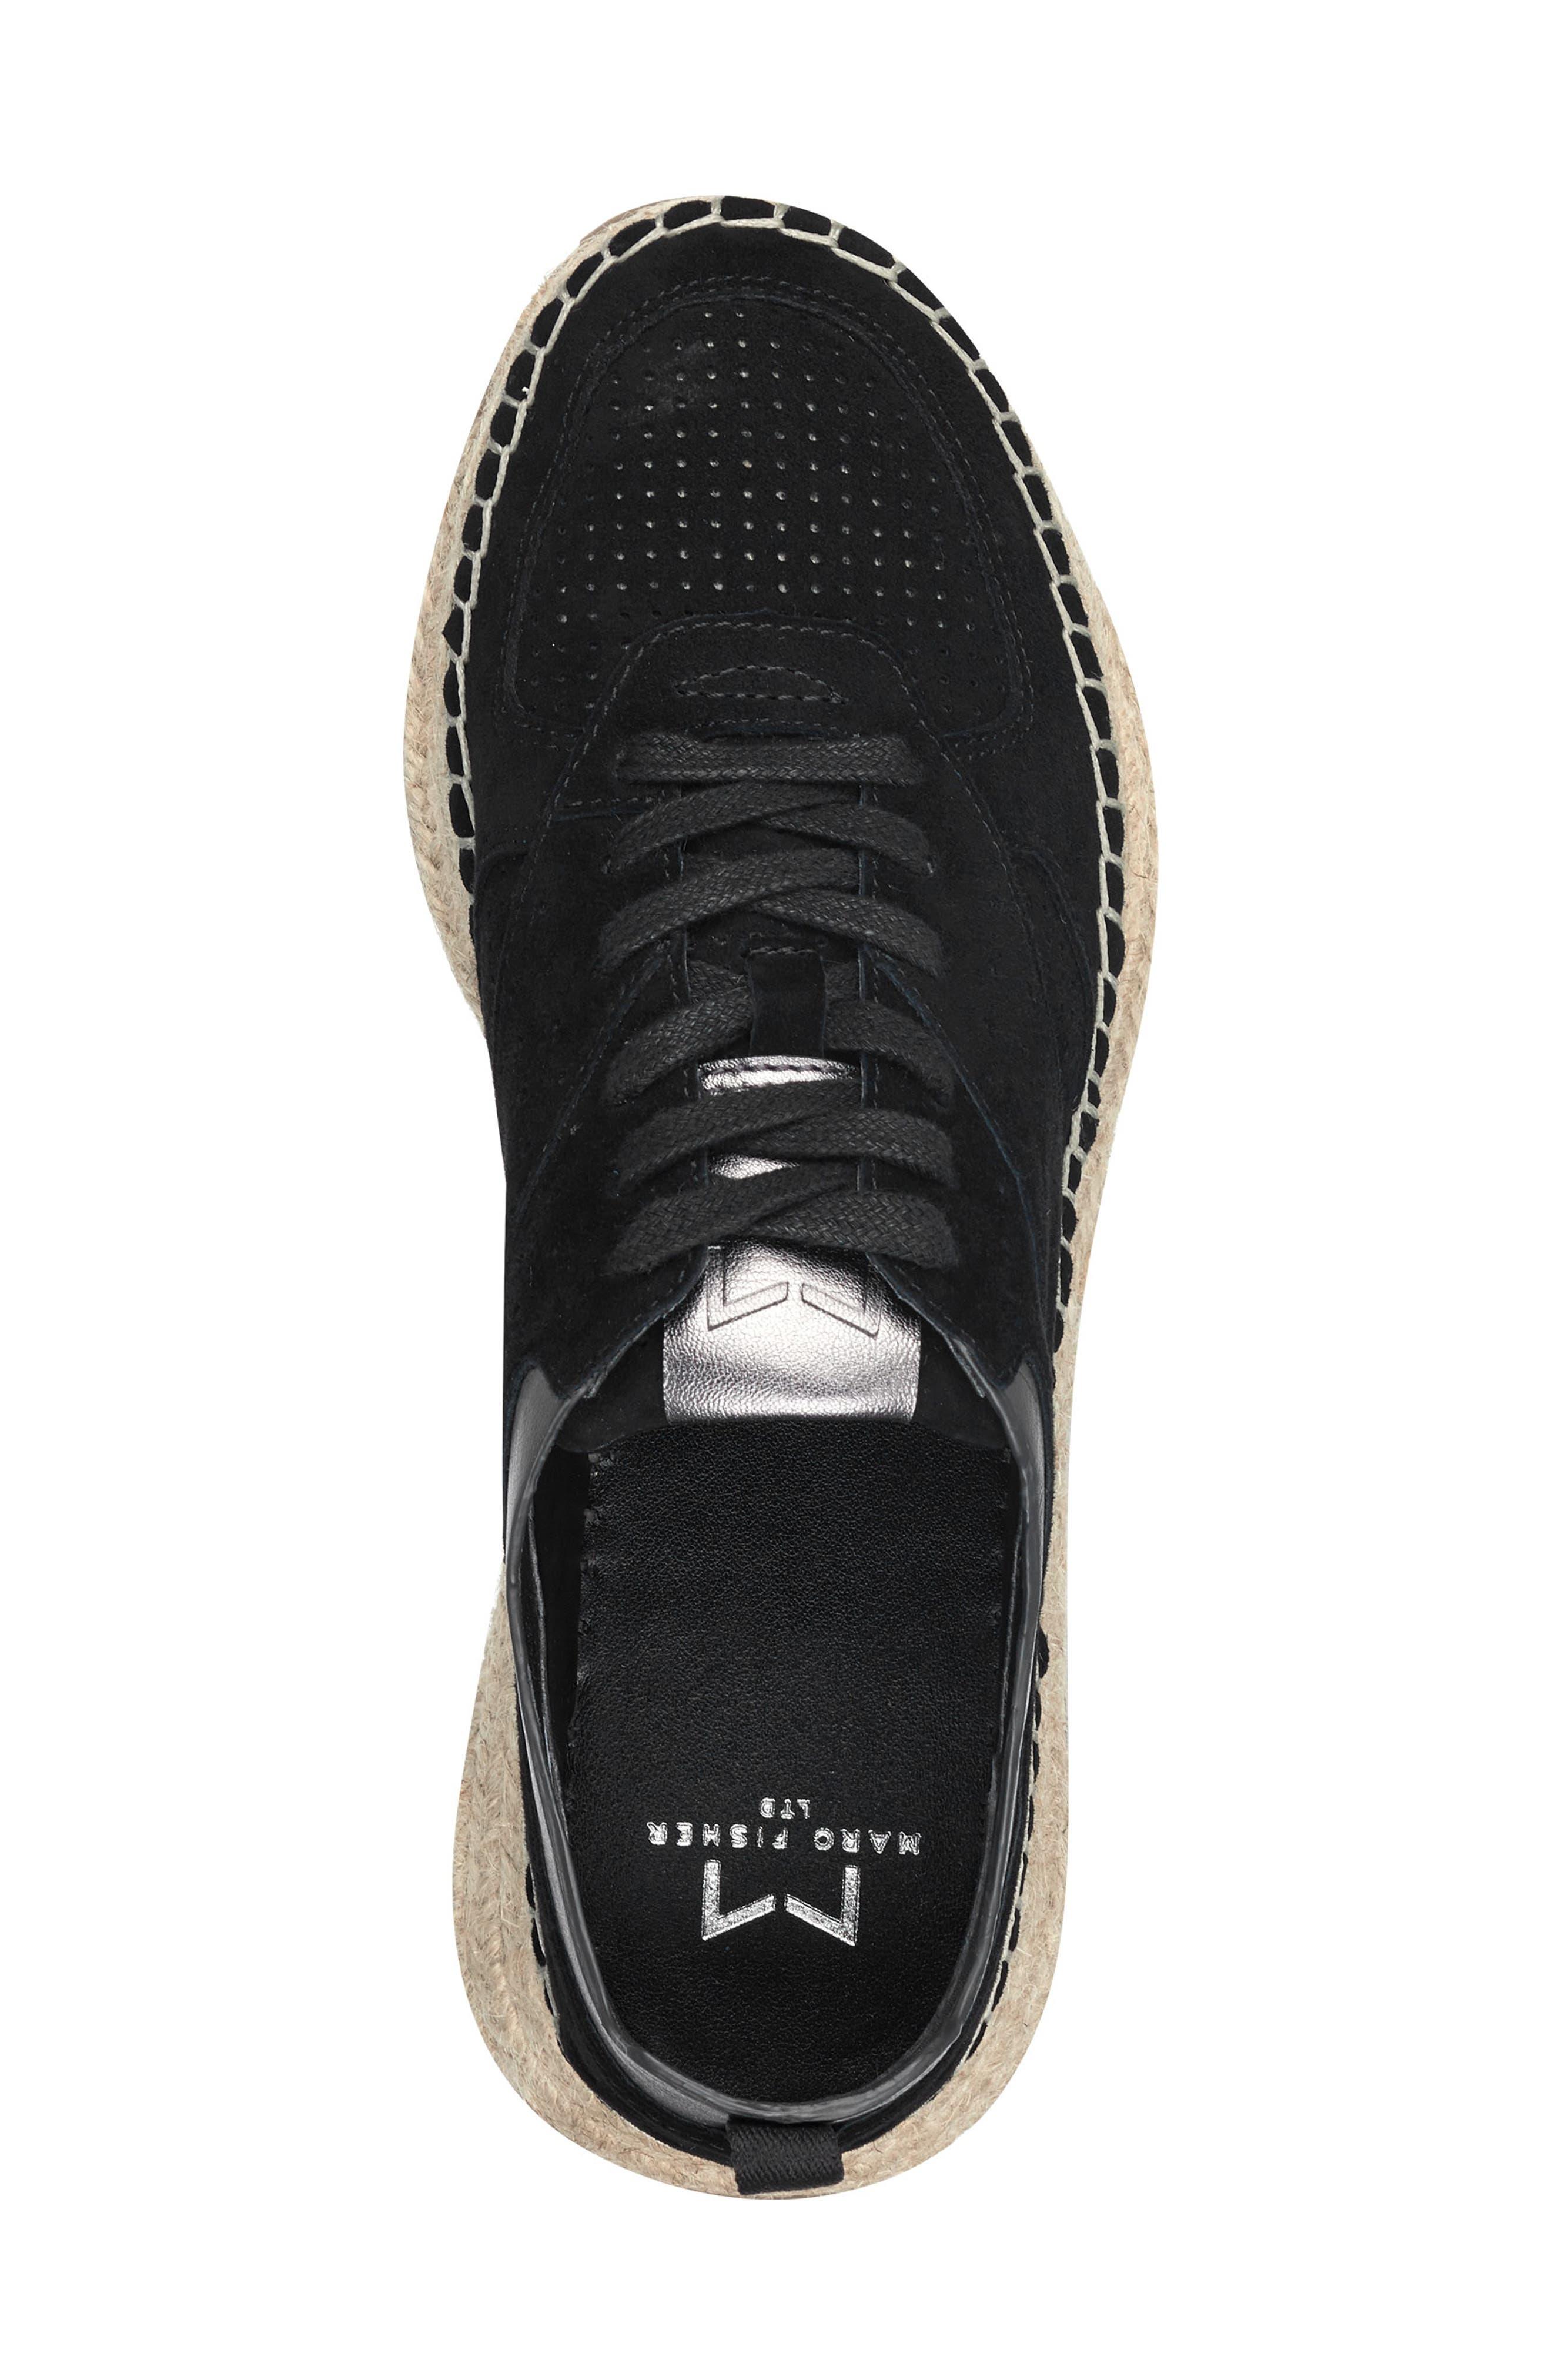 MARC FISHER LTD, Julio Sneaker, Alternate thumbnail 5, color, BLACK SUEDE